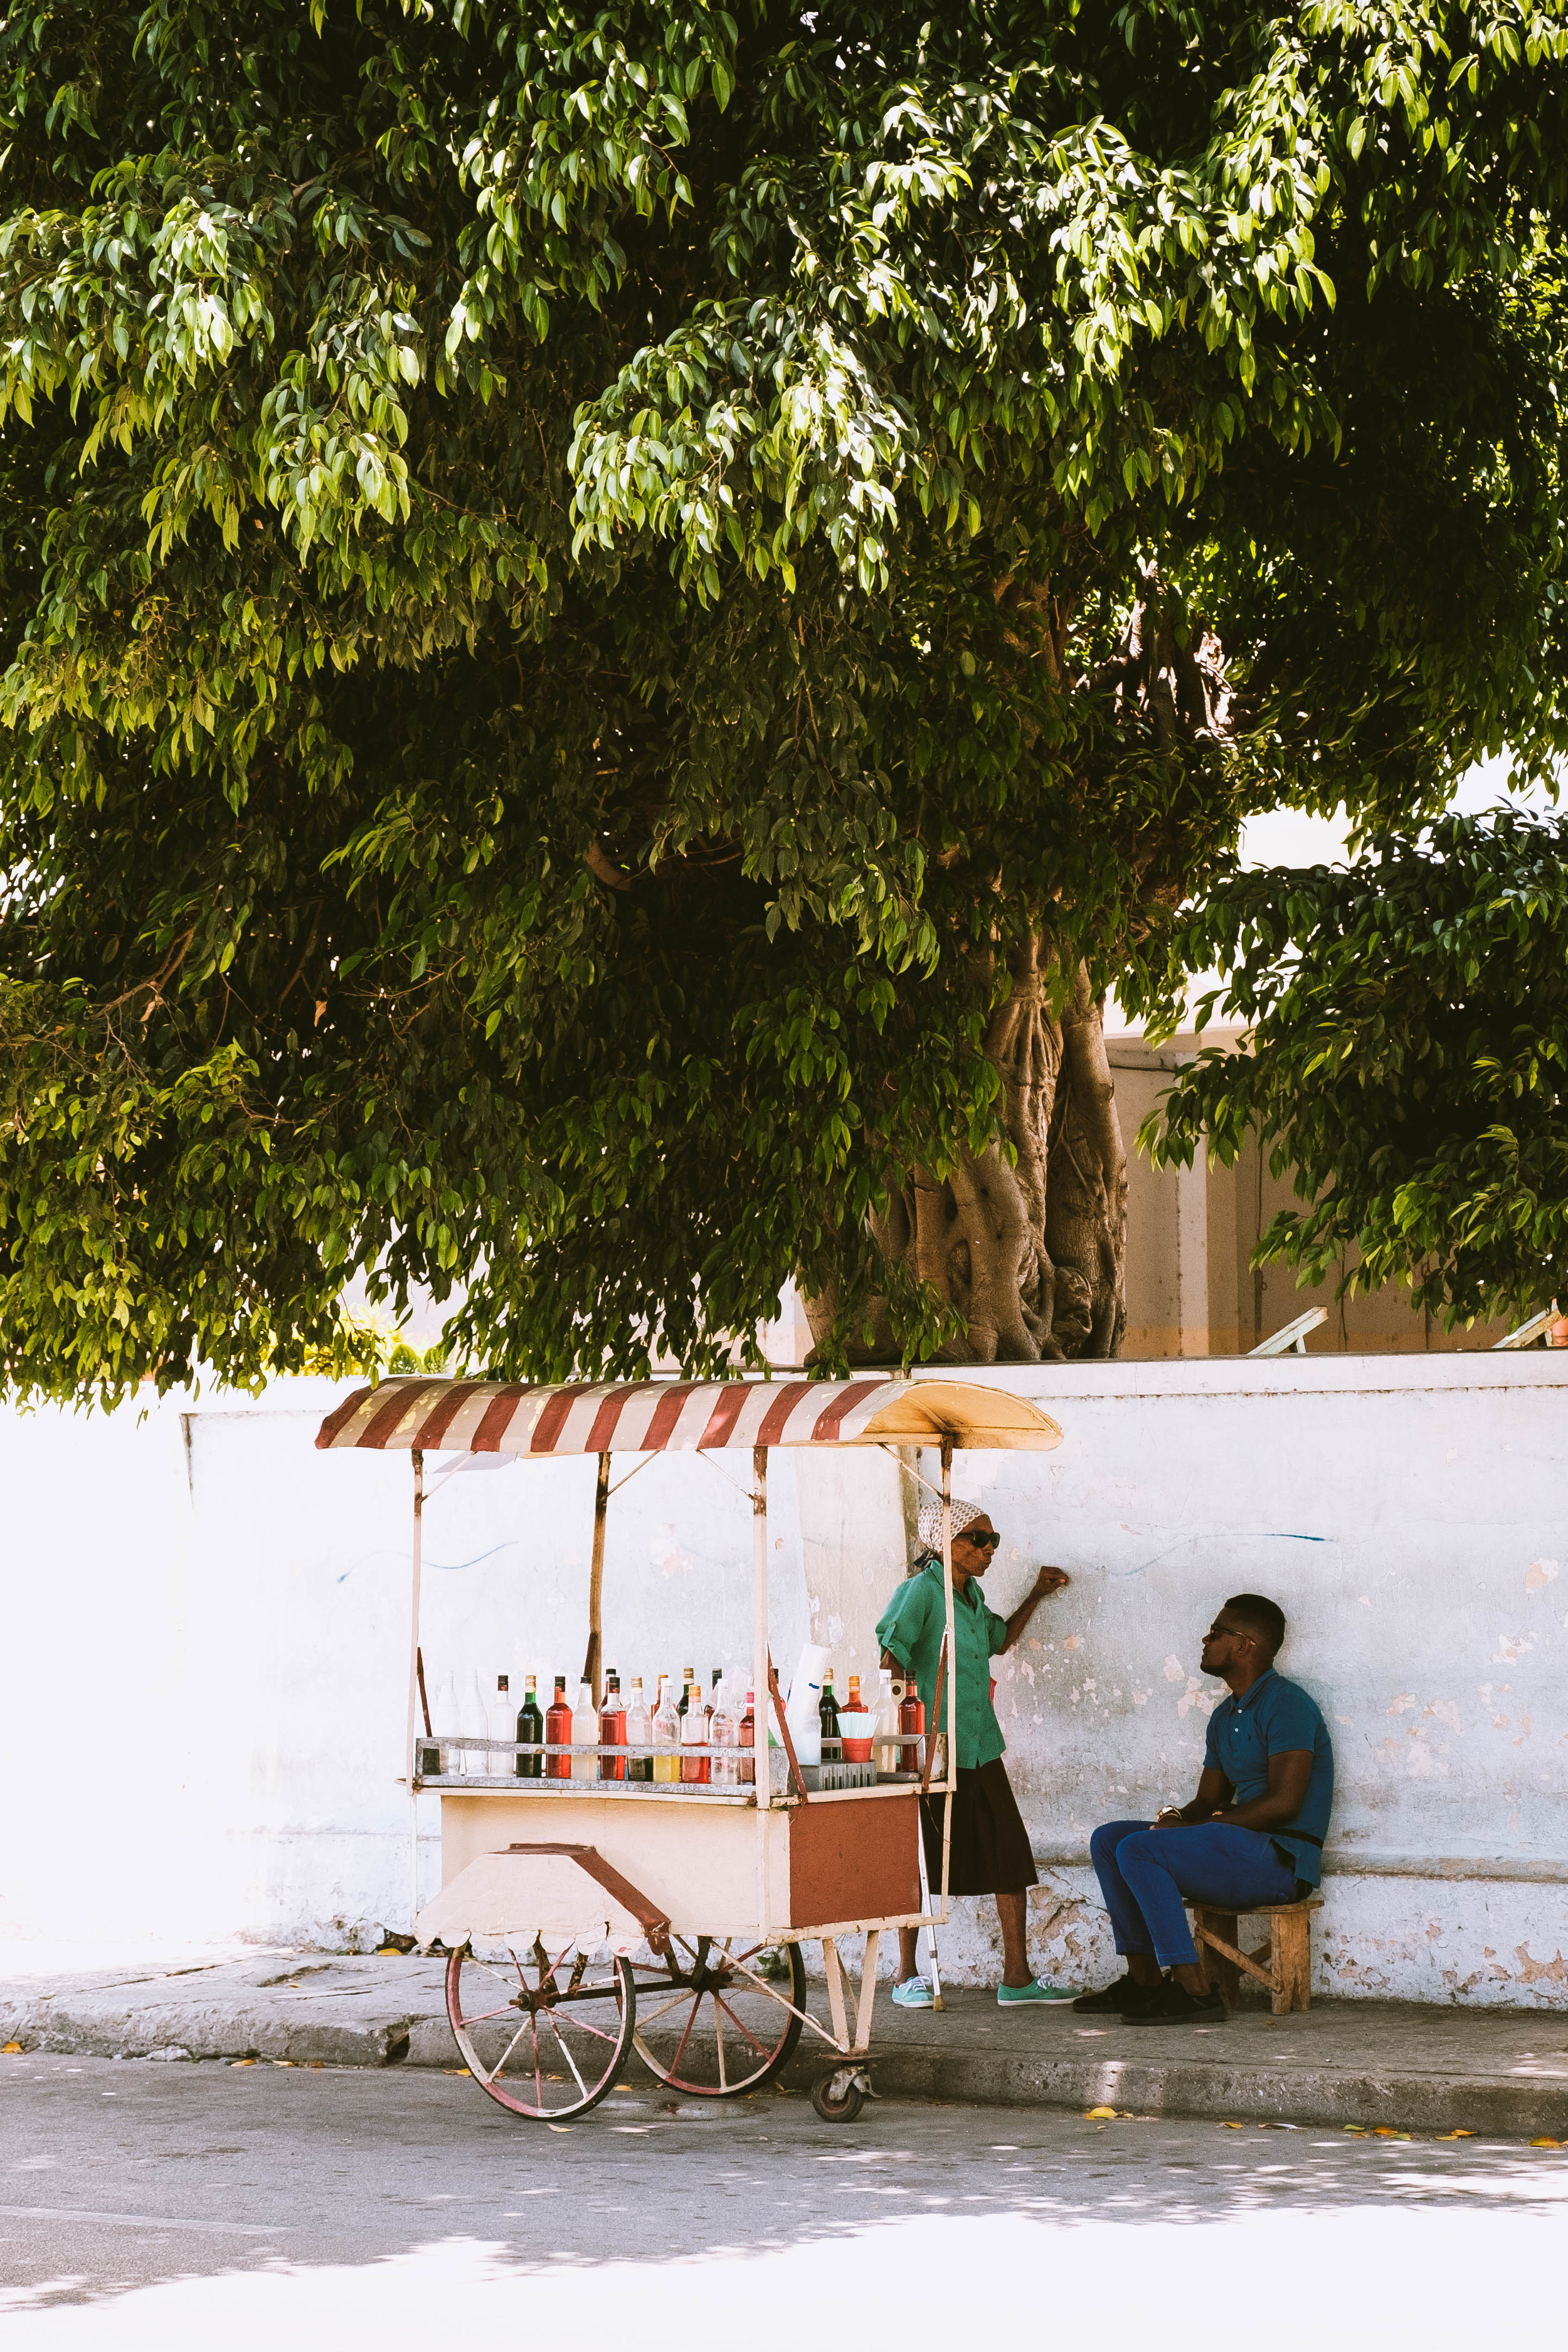 Cookwilltravel - Cuba - DSCF8029.jpg